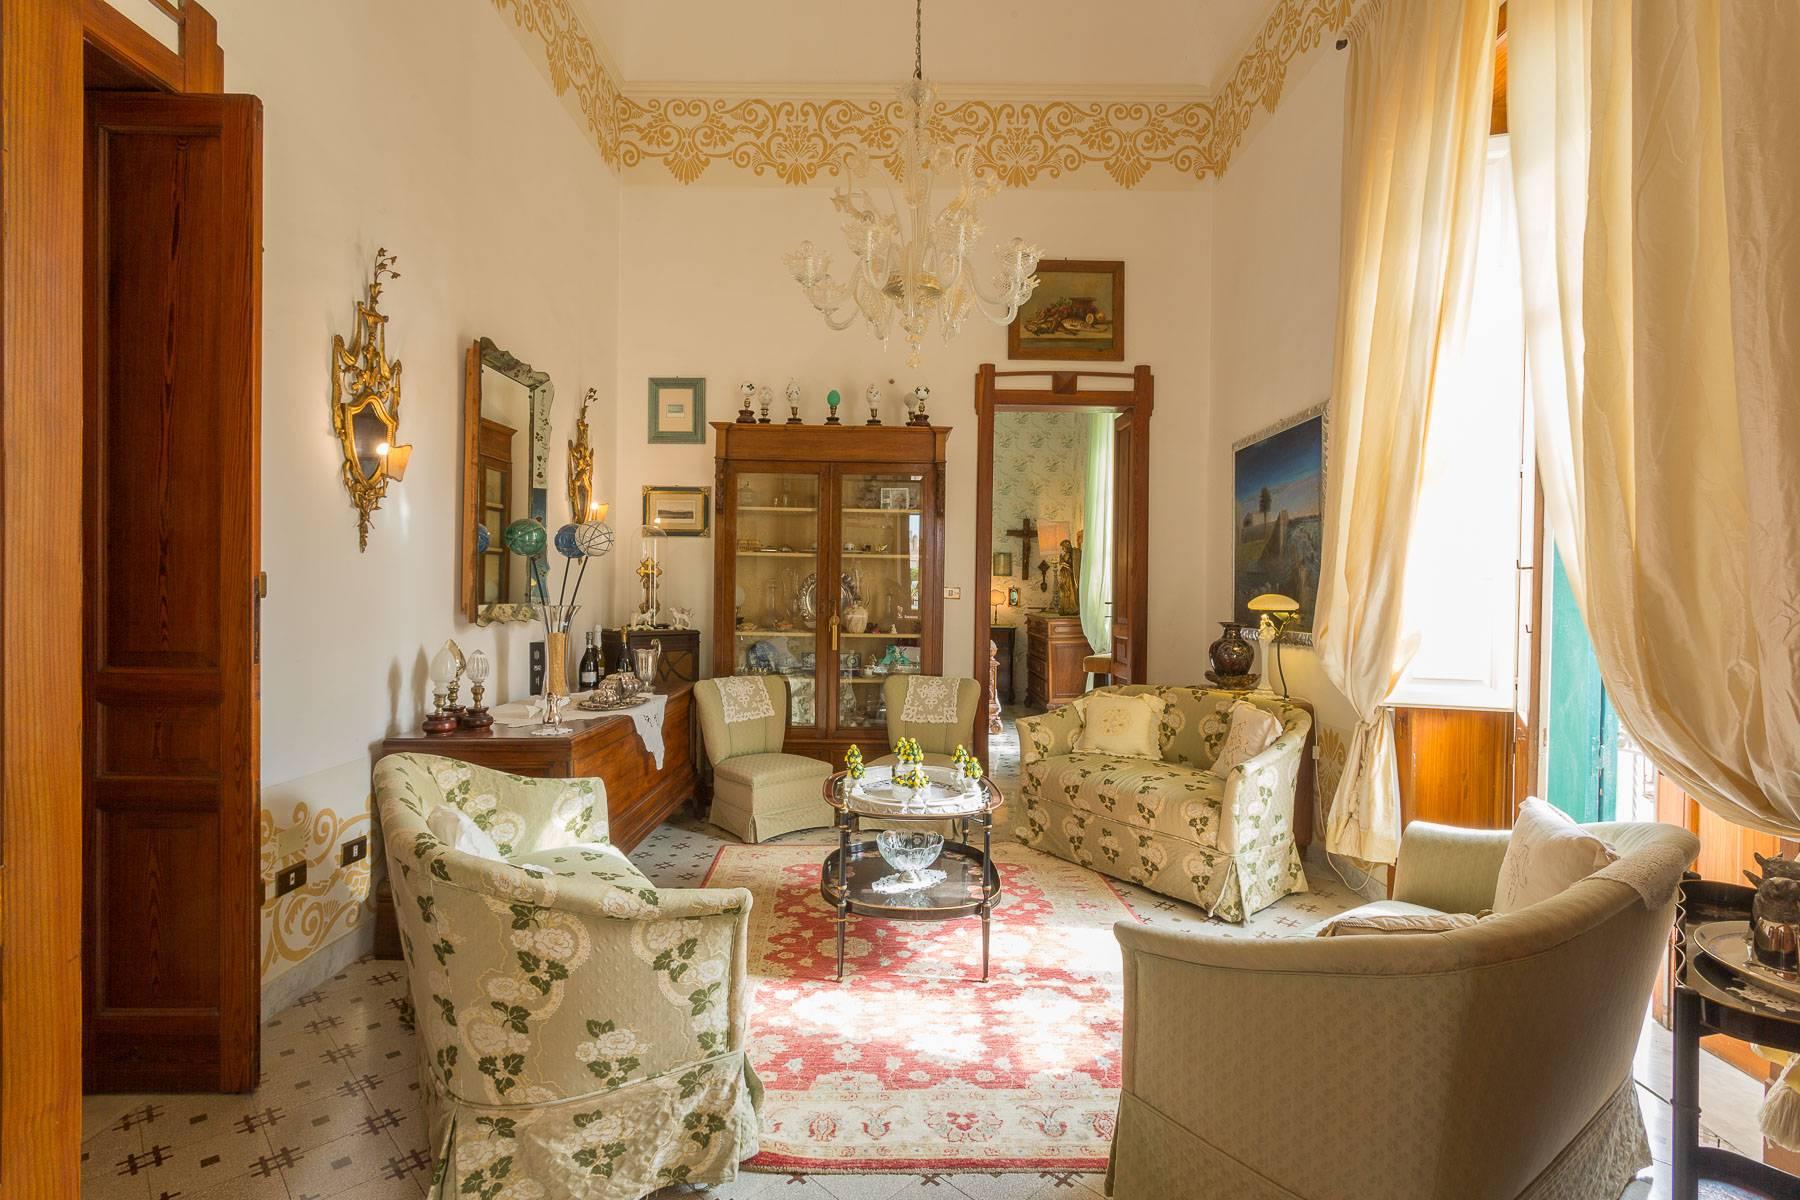 Casa indipendente in Vendita a Noto: 5 locali, 280 mq - Foto 9